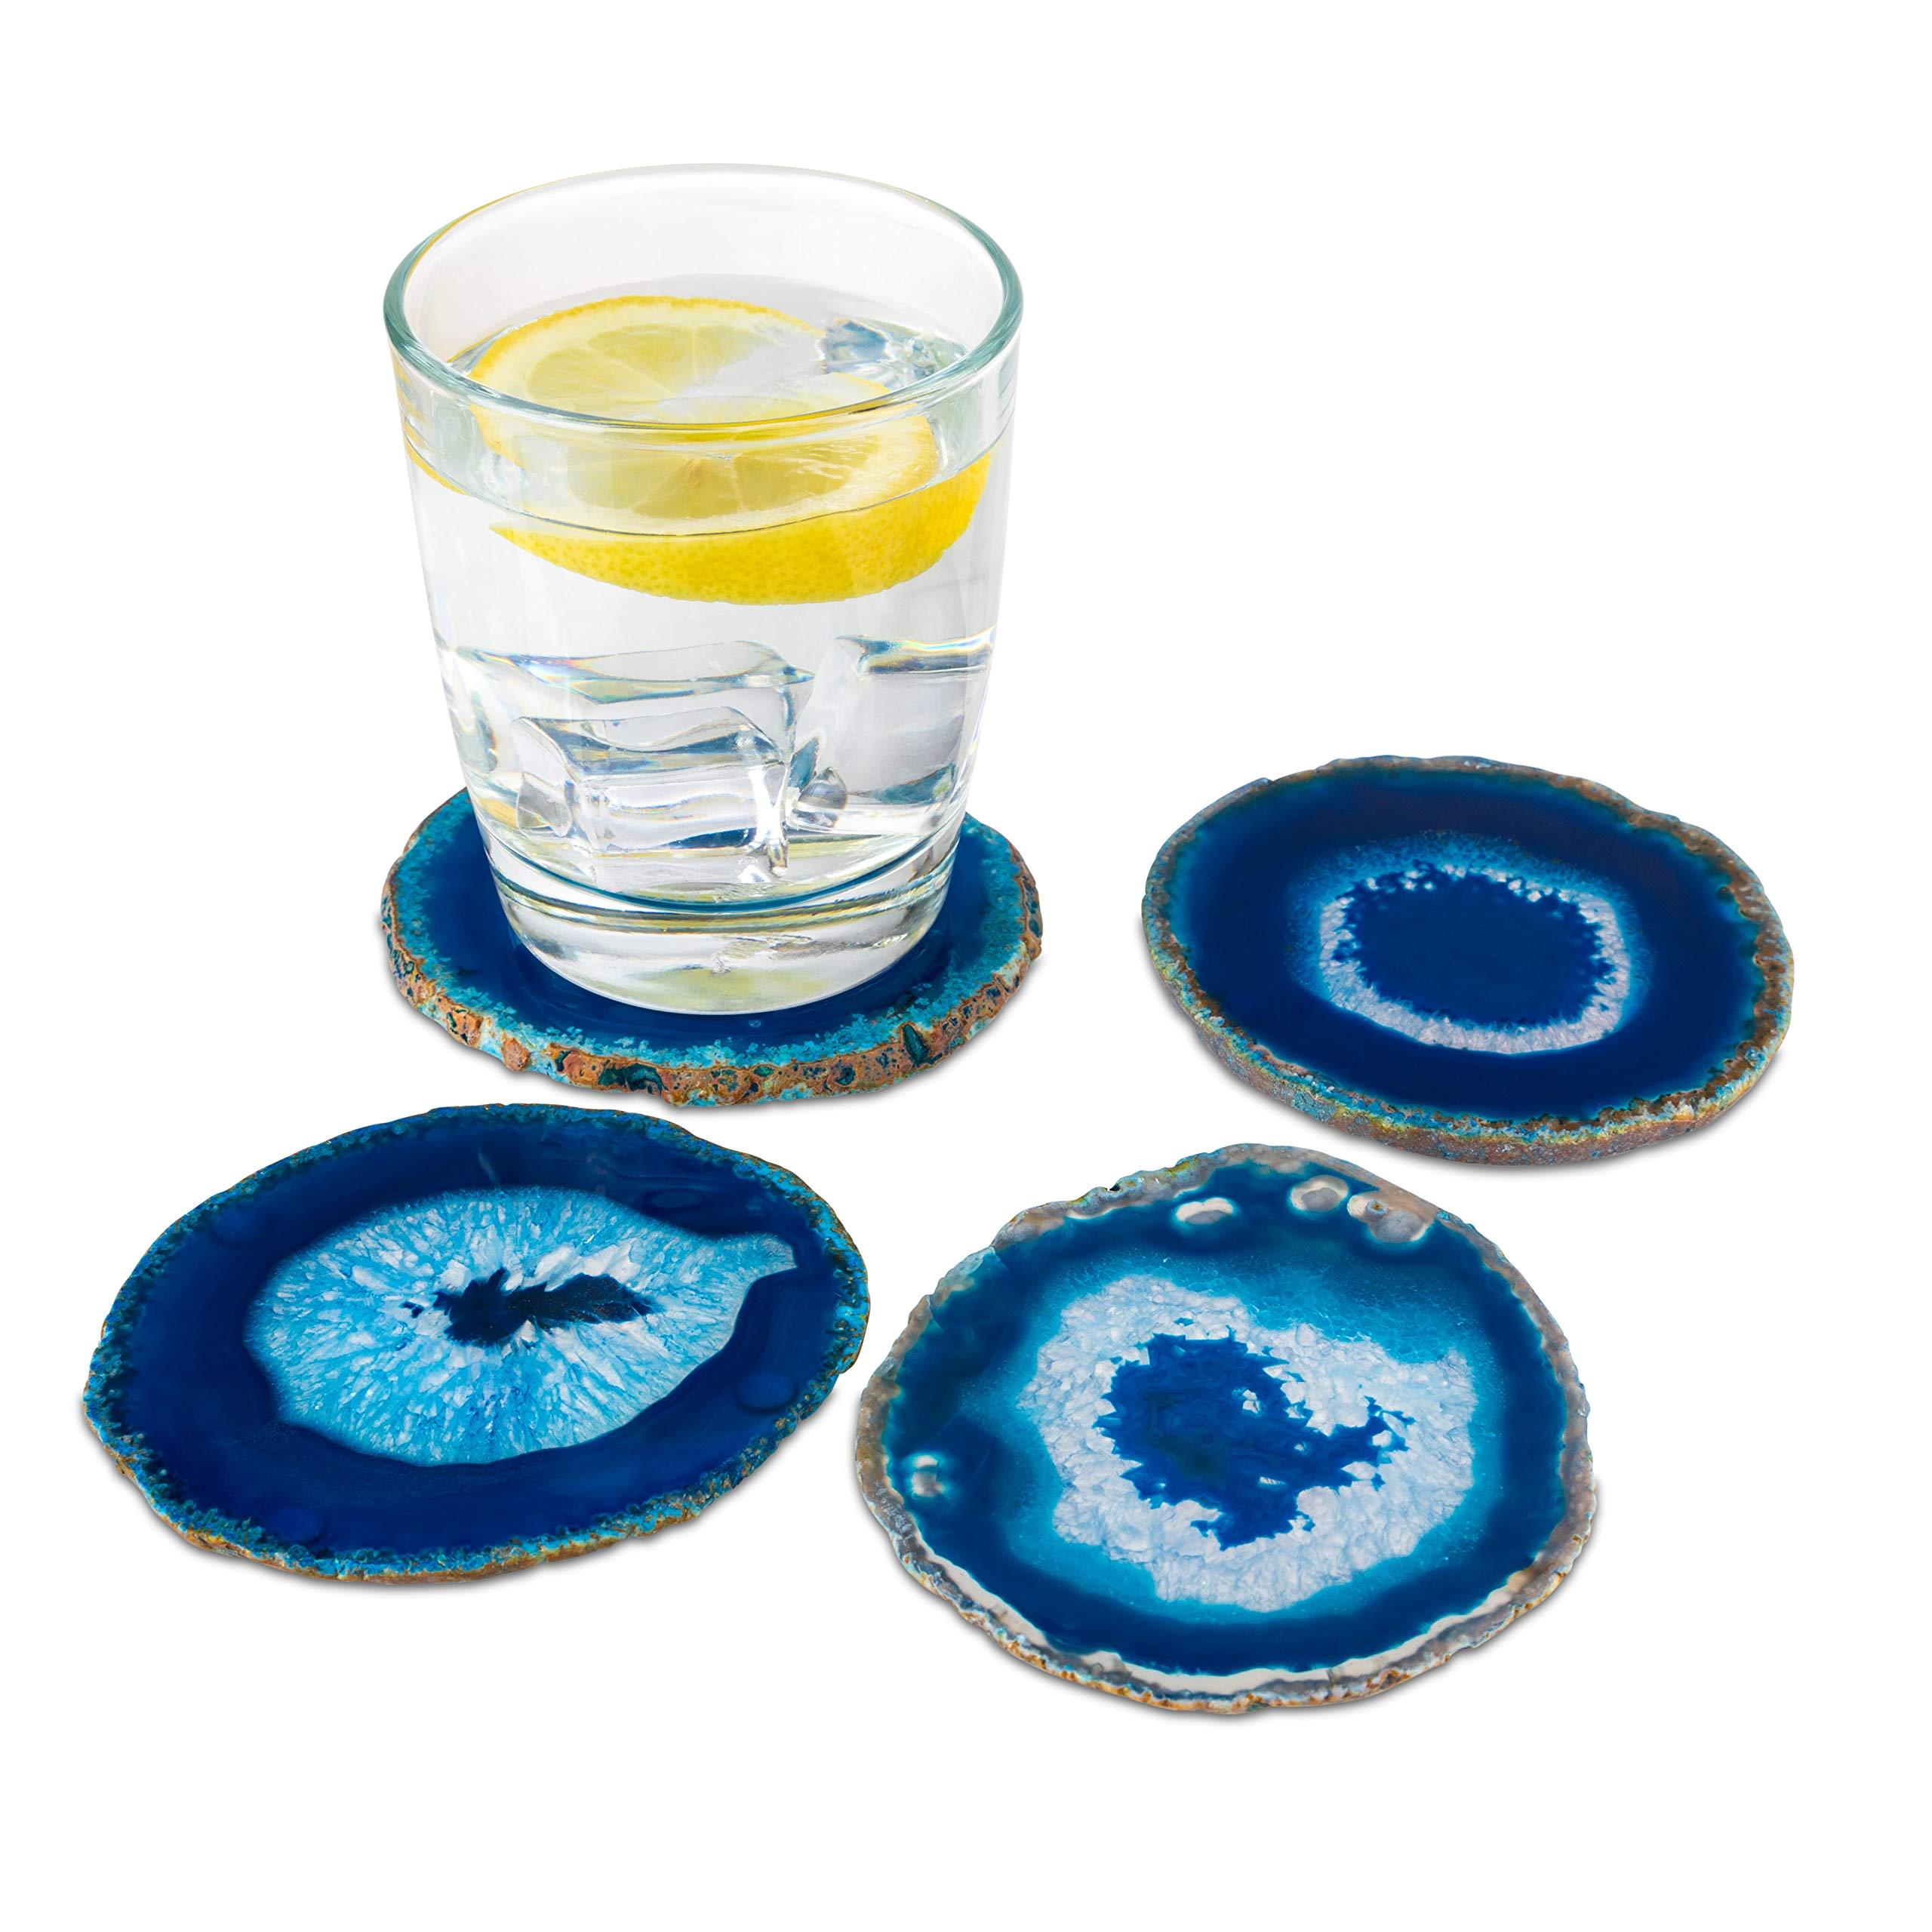 Blue Agate Coasters Set of 4 - 3.5''-4'' - Brazilian Geode Crystal Decor - (3.5''-4'' Blue)